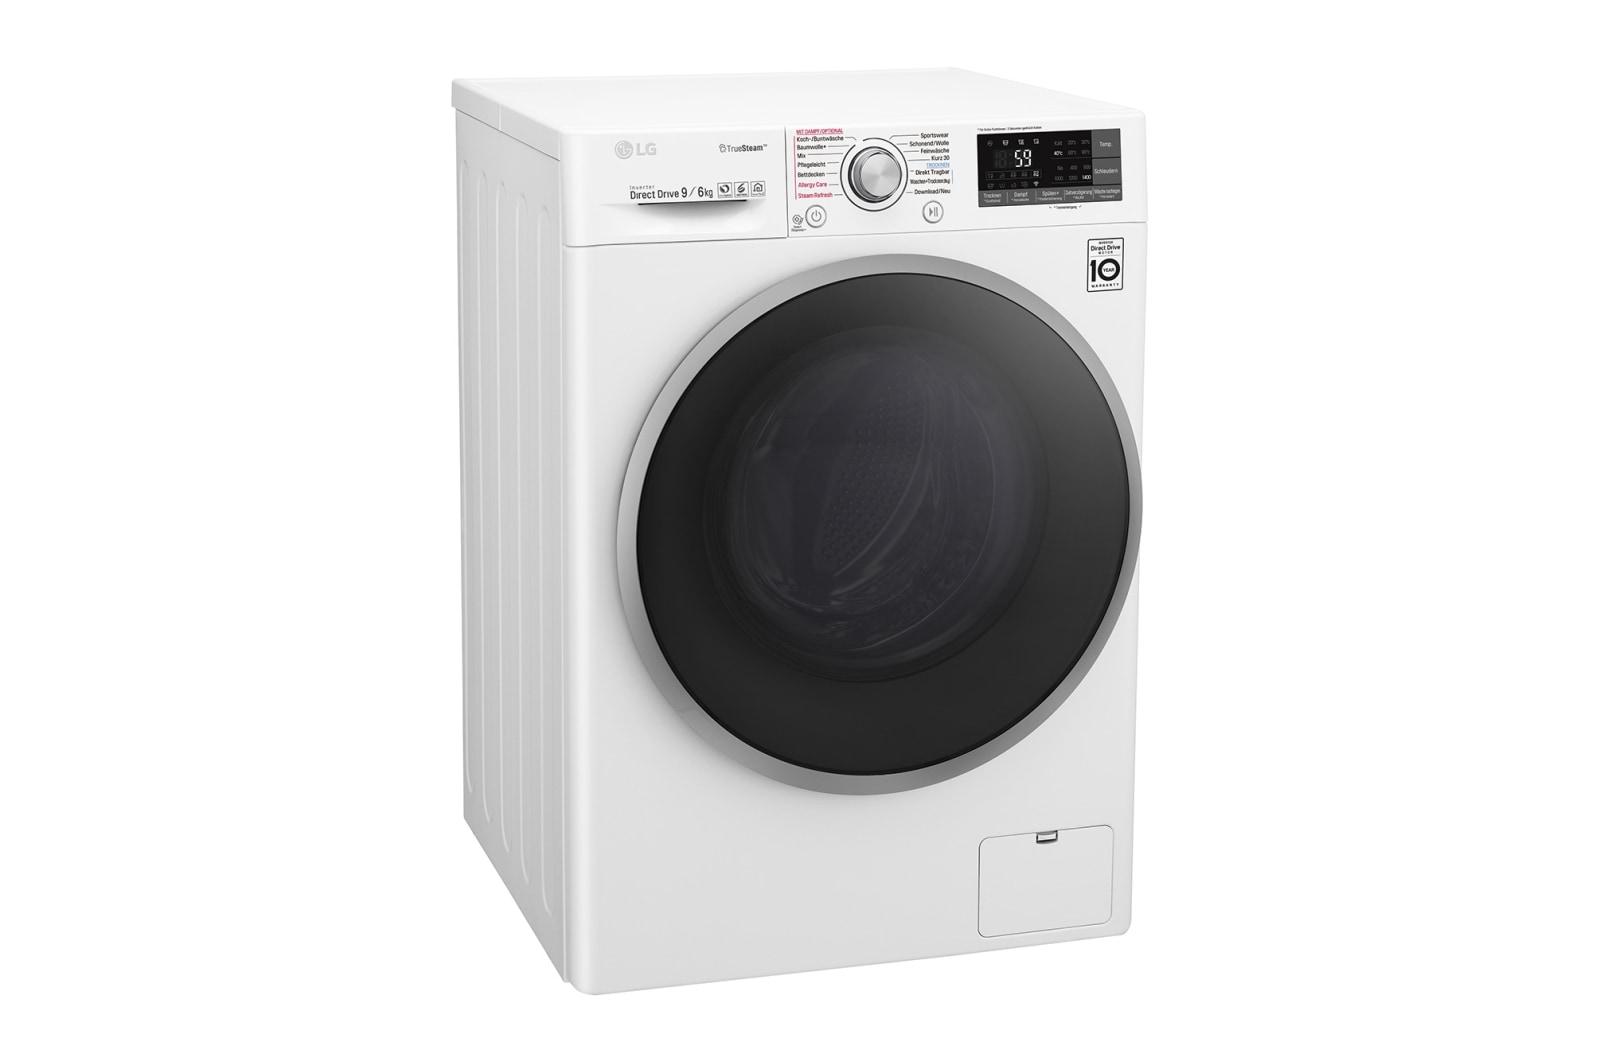 Lg waschtrockner 9 kg waschen 6 kg trocknen truesteam™ wlan